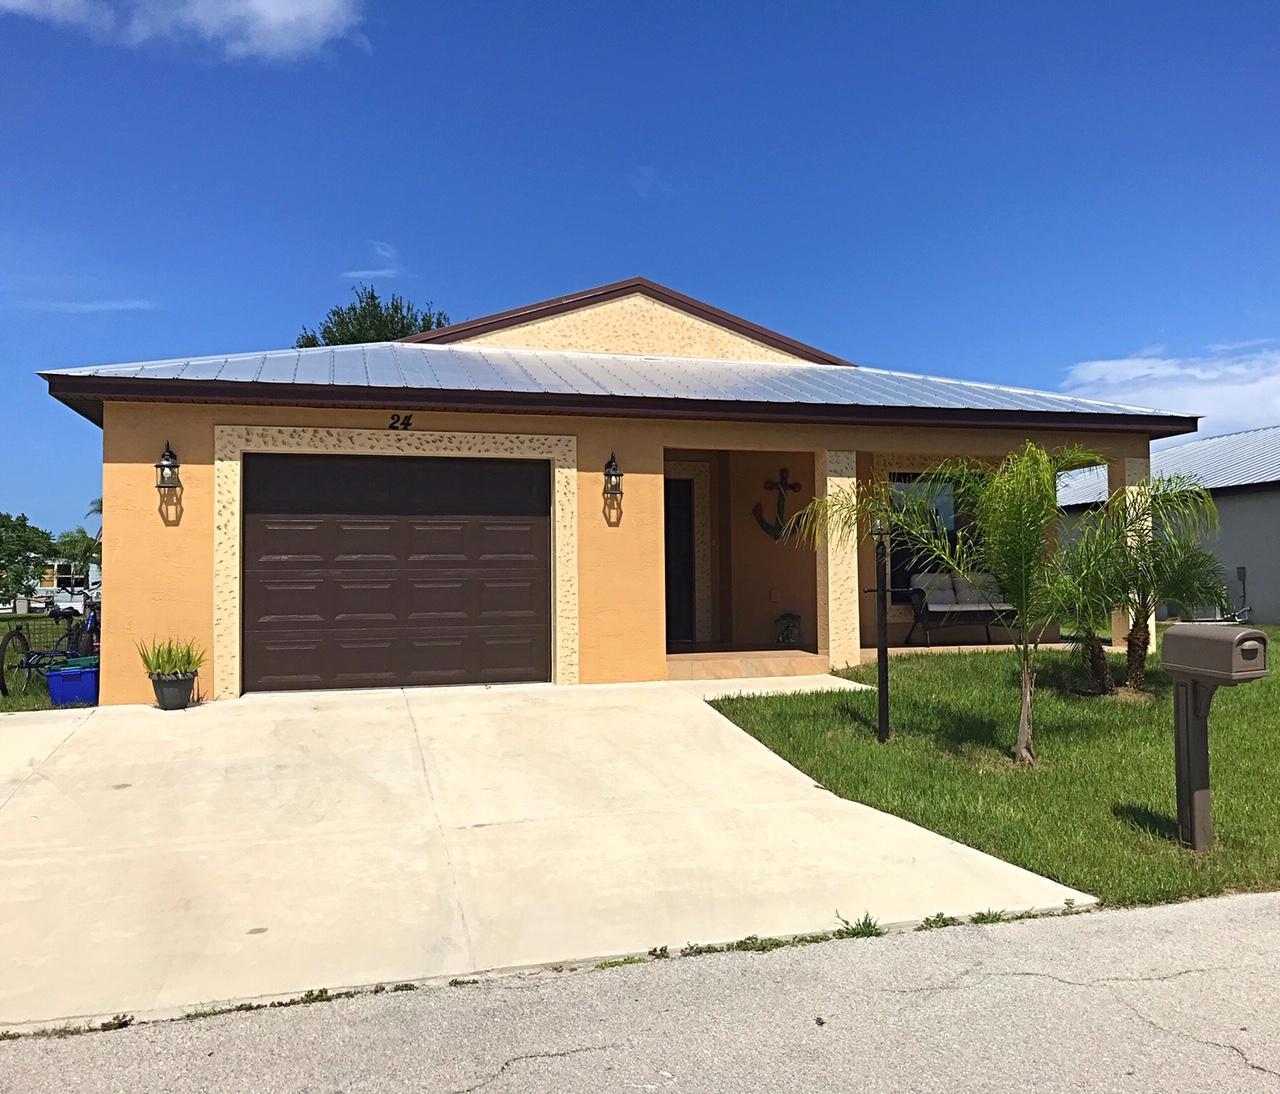 Photo of 24 Alta Loma, Port Saint Lucie, FL 34952